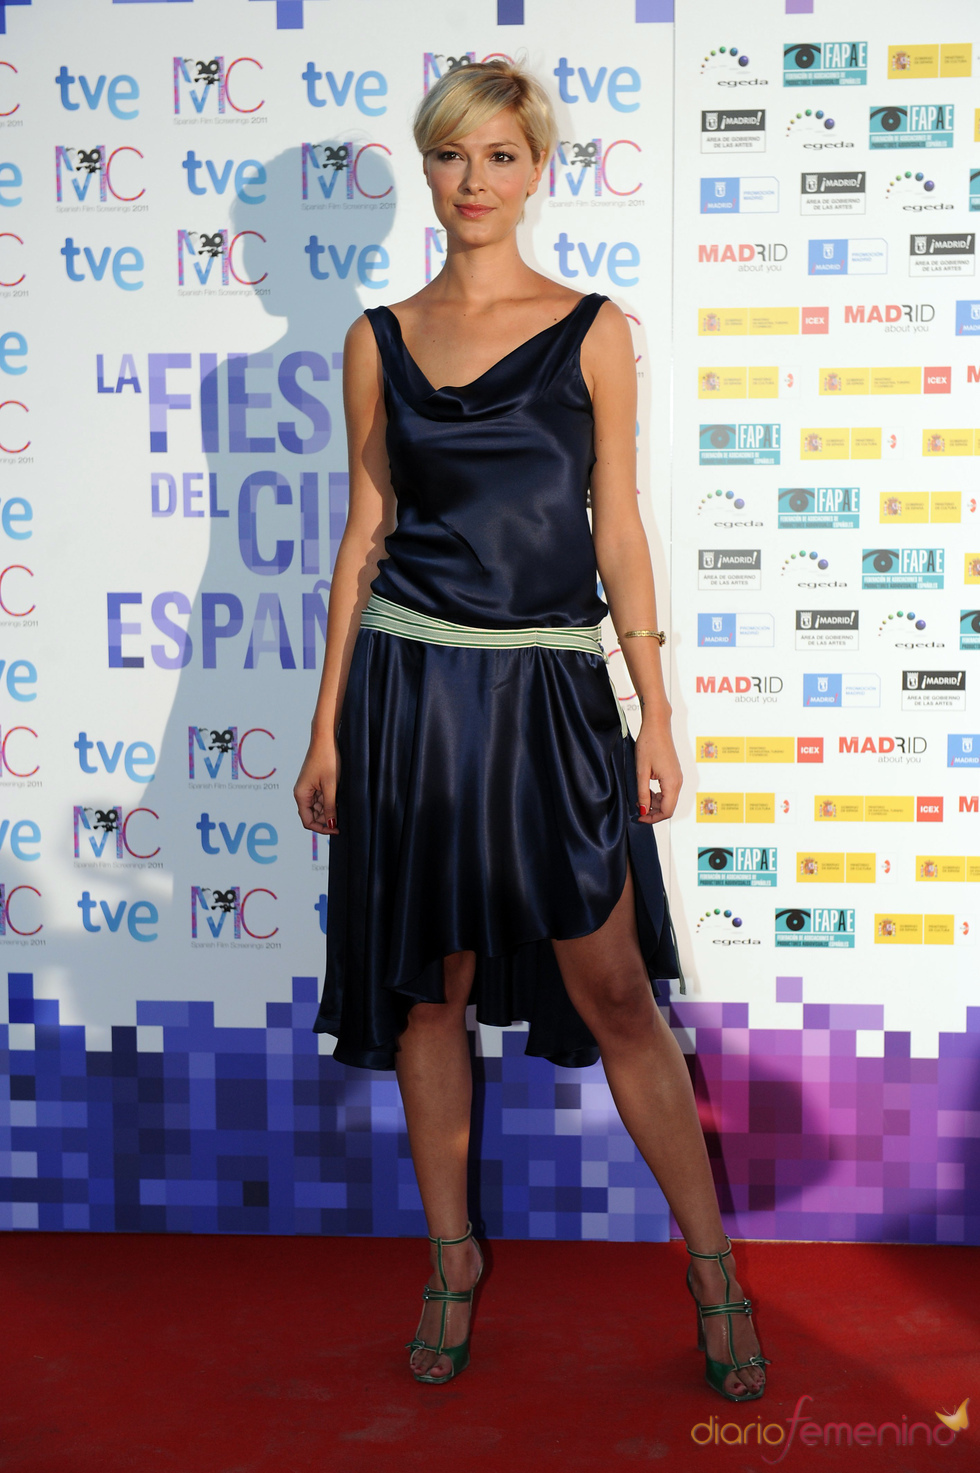 Cristina Urgel en la Fiesta del Cine español